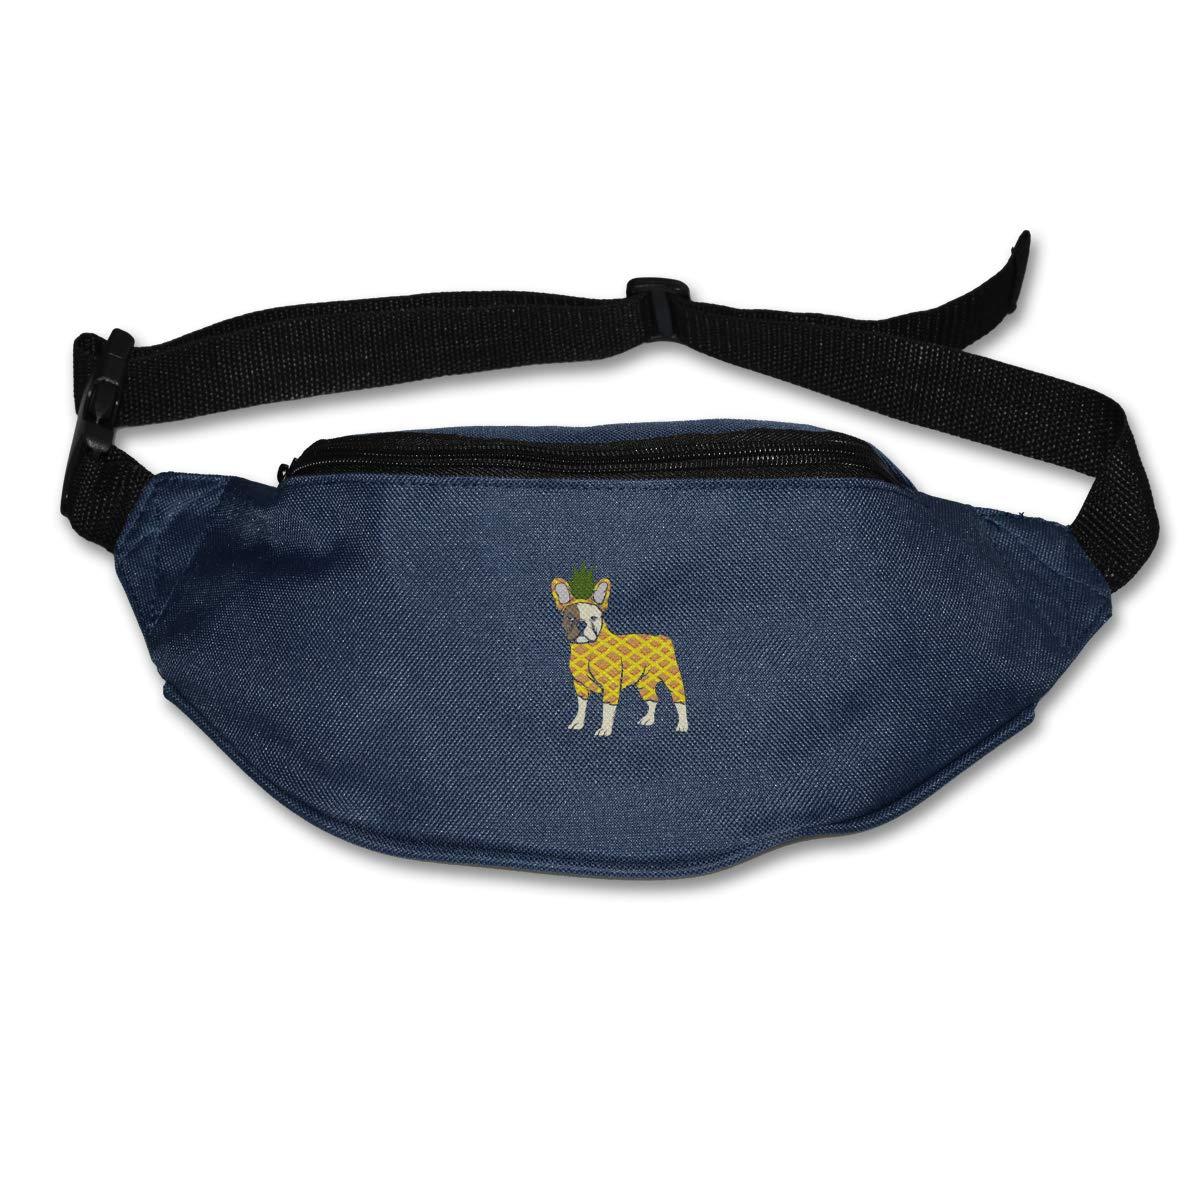 Pineapple Pug Funny Sport Waist Pack Fanny Pack Adjustable For Hike